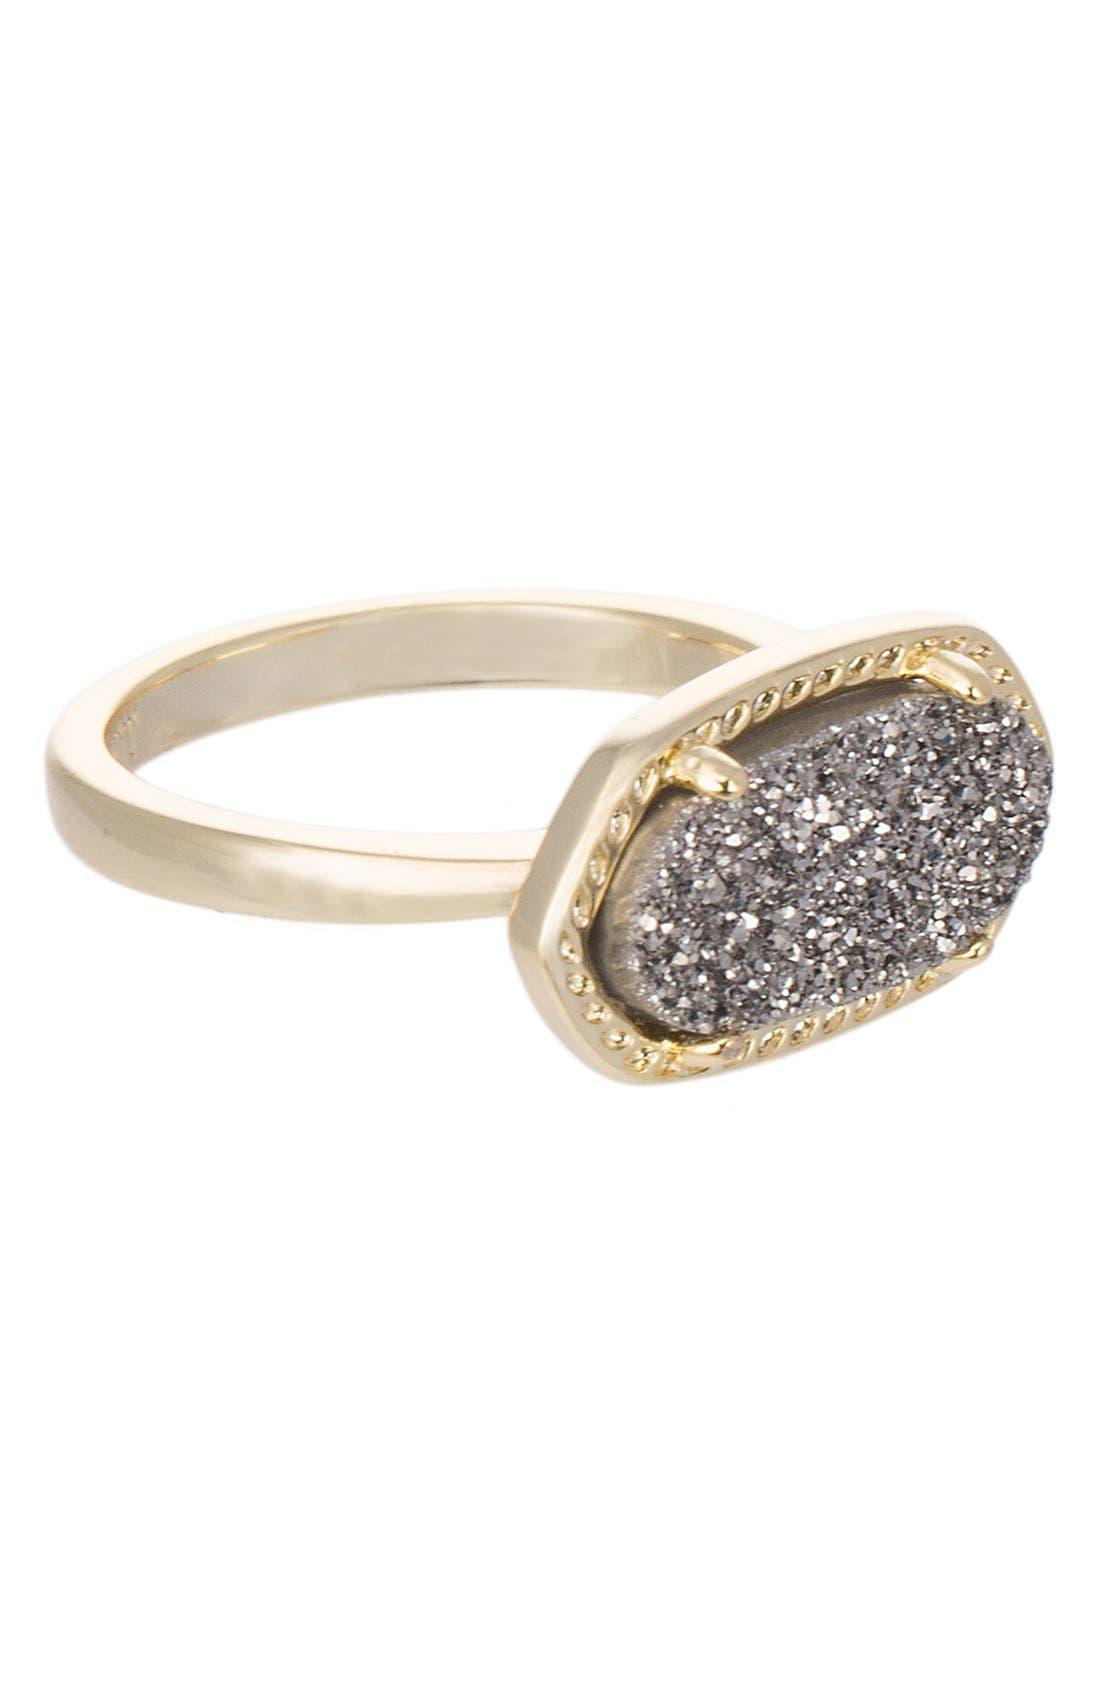 Main Image - Kendra Scott 'Ella' Drusy Ring